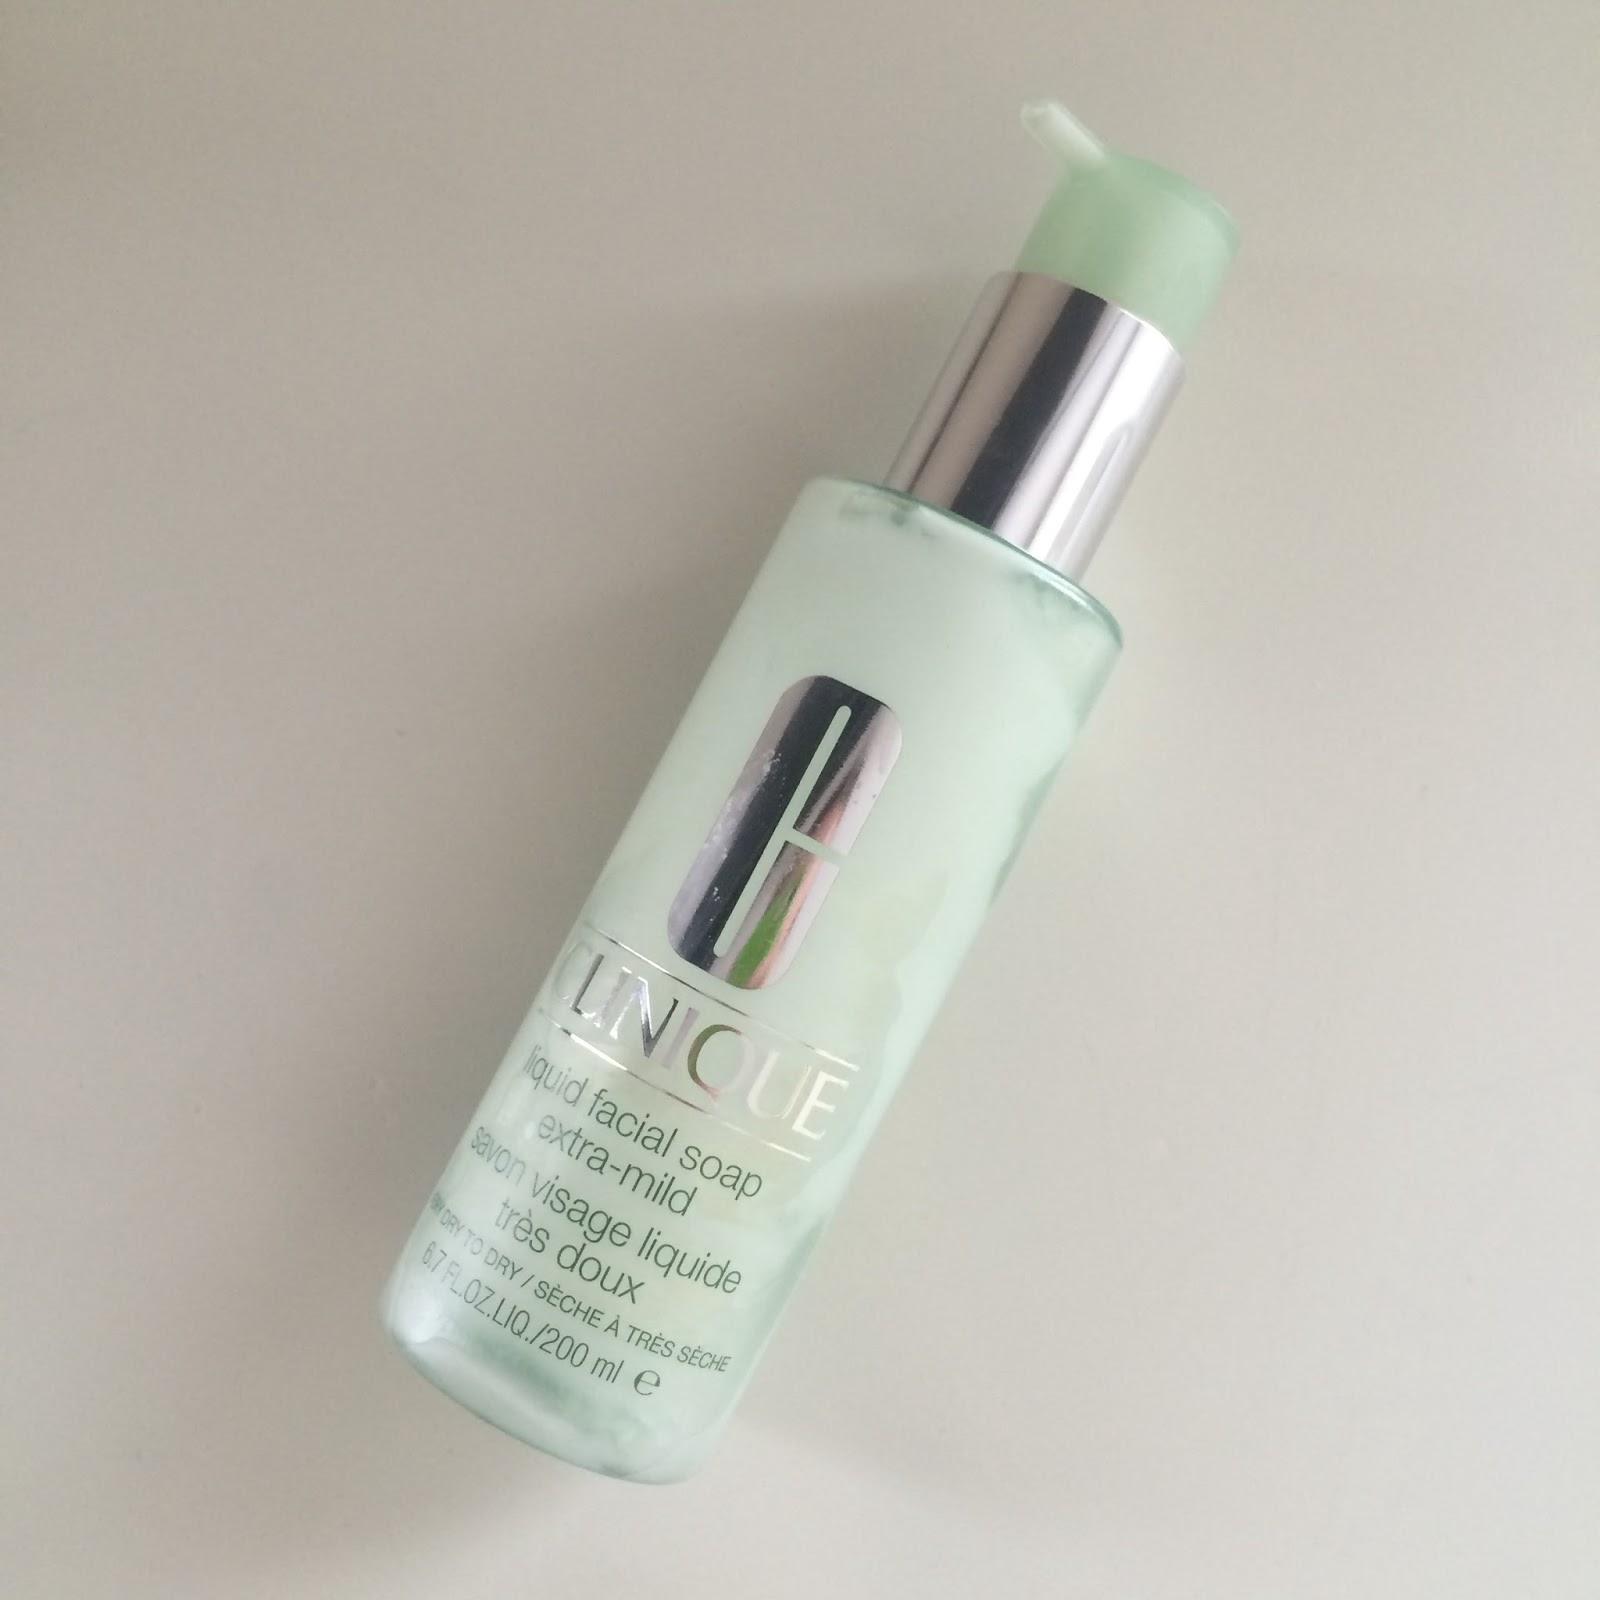 Facial Soap Extra Mild by Clinique #18